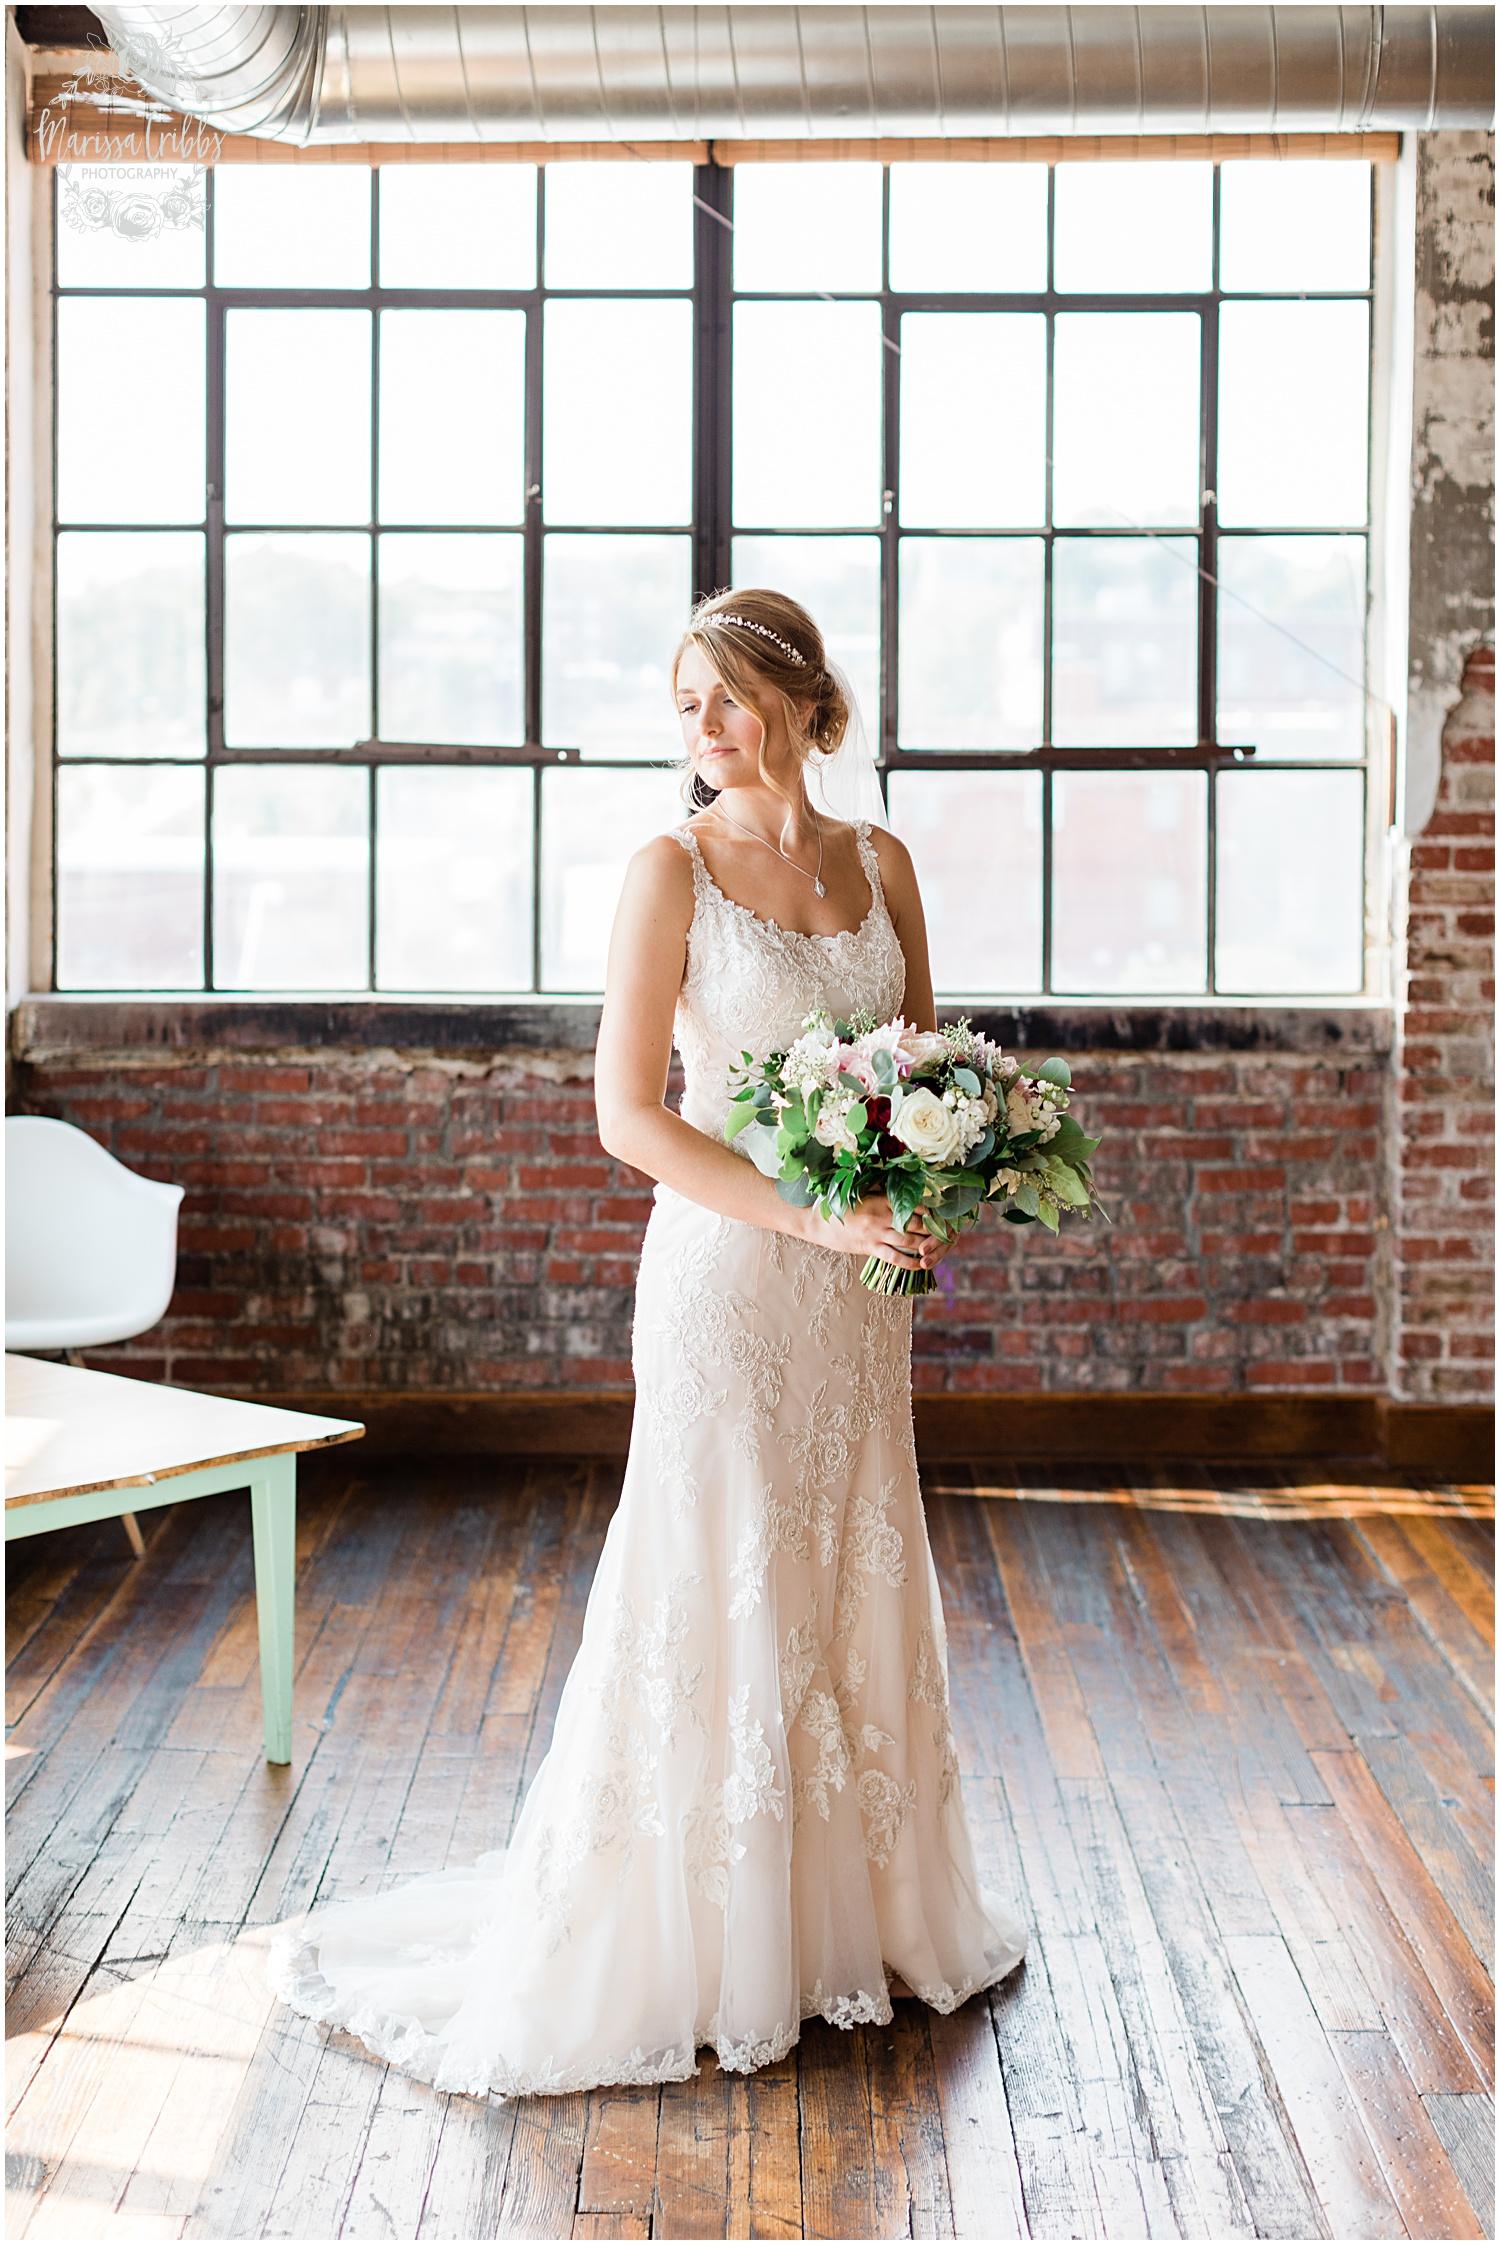 BAUER WEDDING   KELSEA & JUSTIN   MARISSA CRIBBS PHOTOGRAPHY_6513.jpg